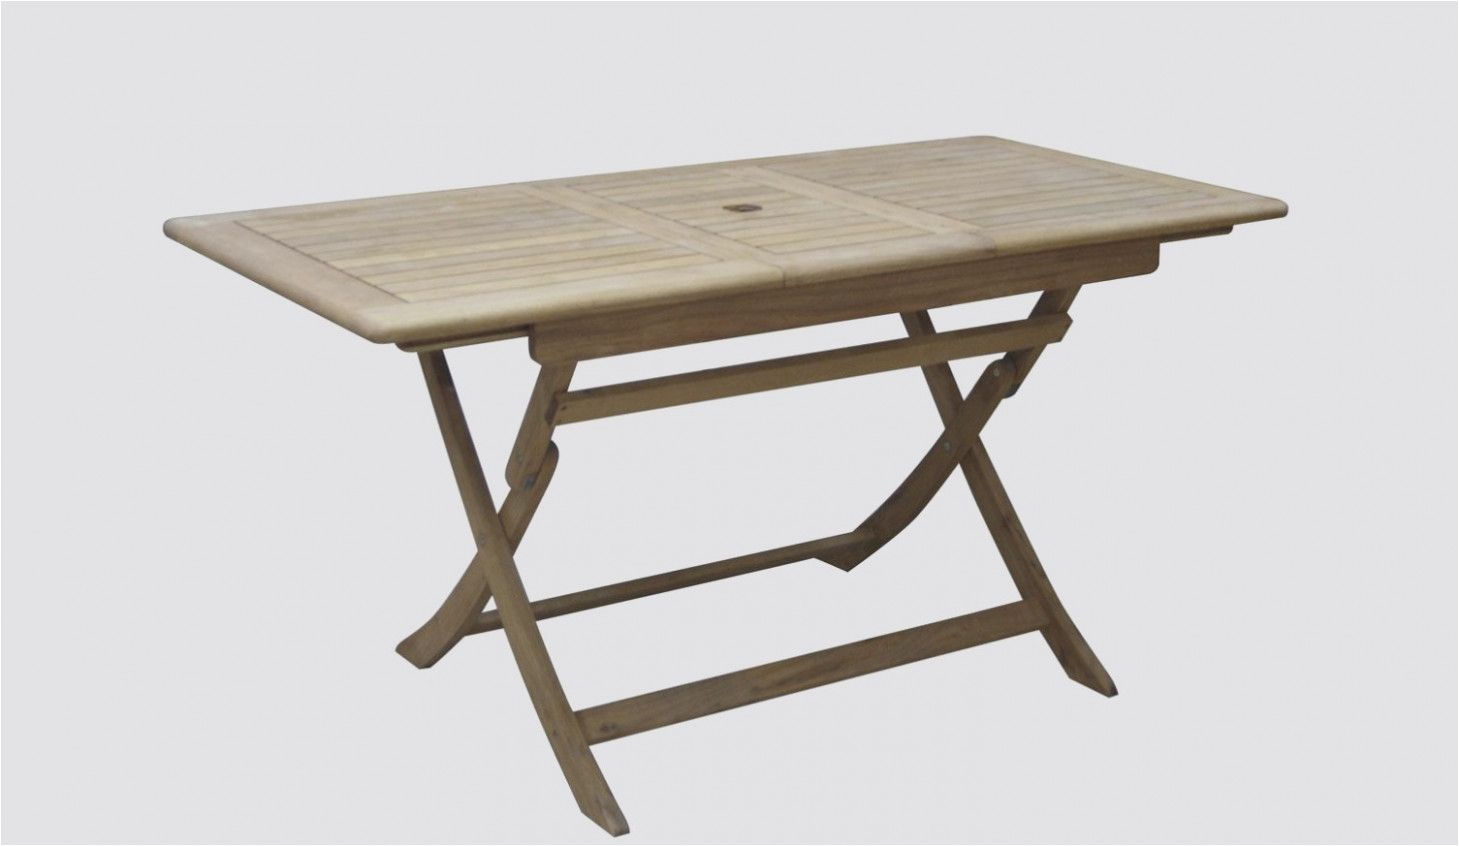 Ikea Table De Jardin Pliable In 2020 Picnic Table Folding Table Table